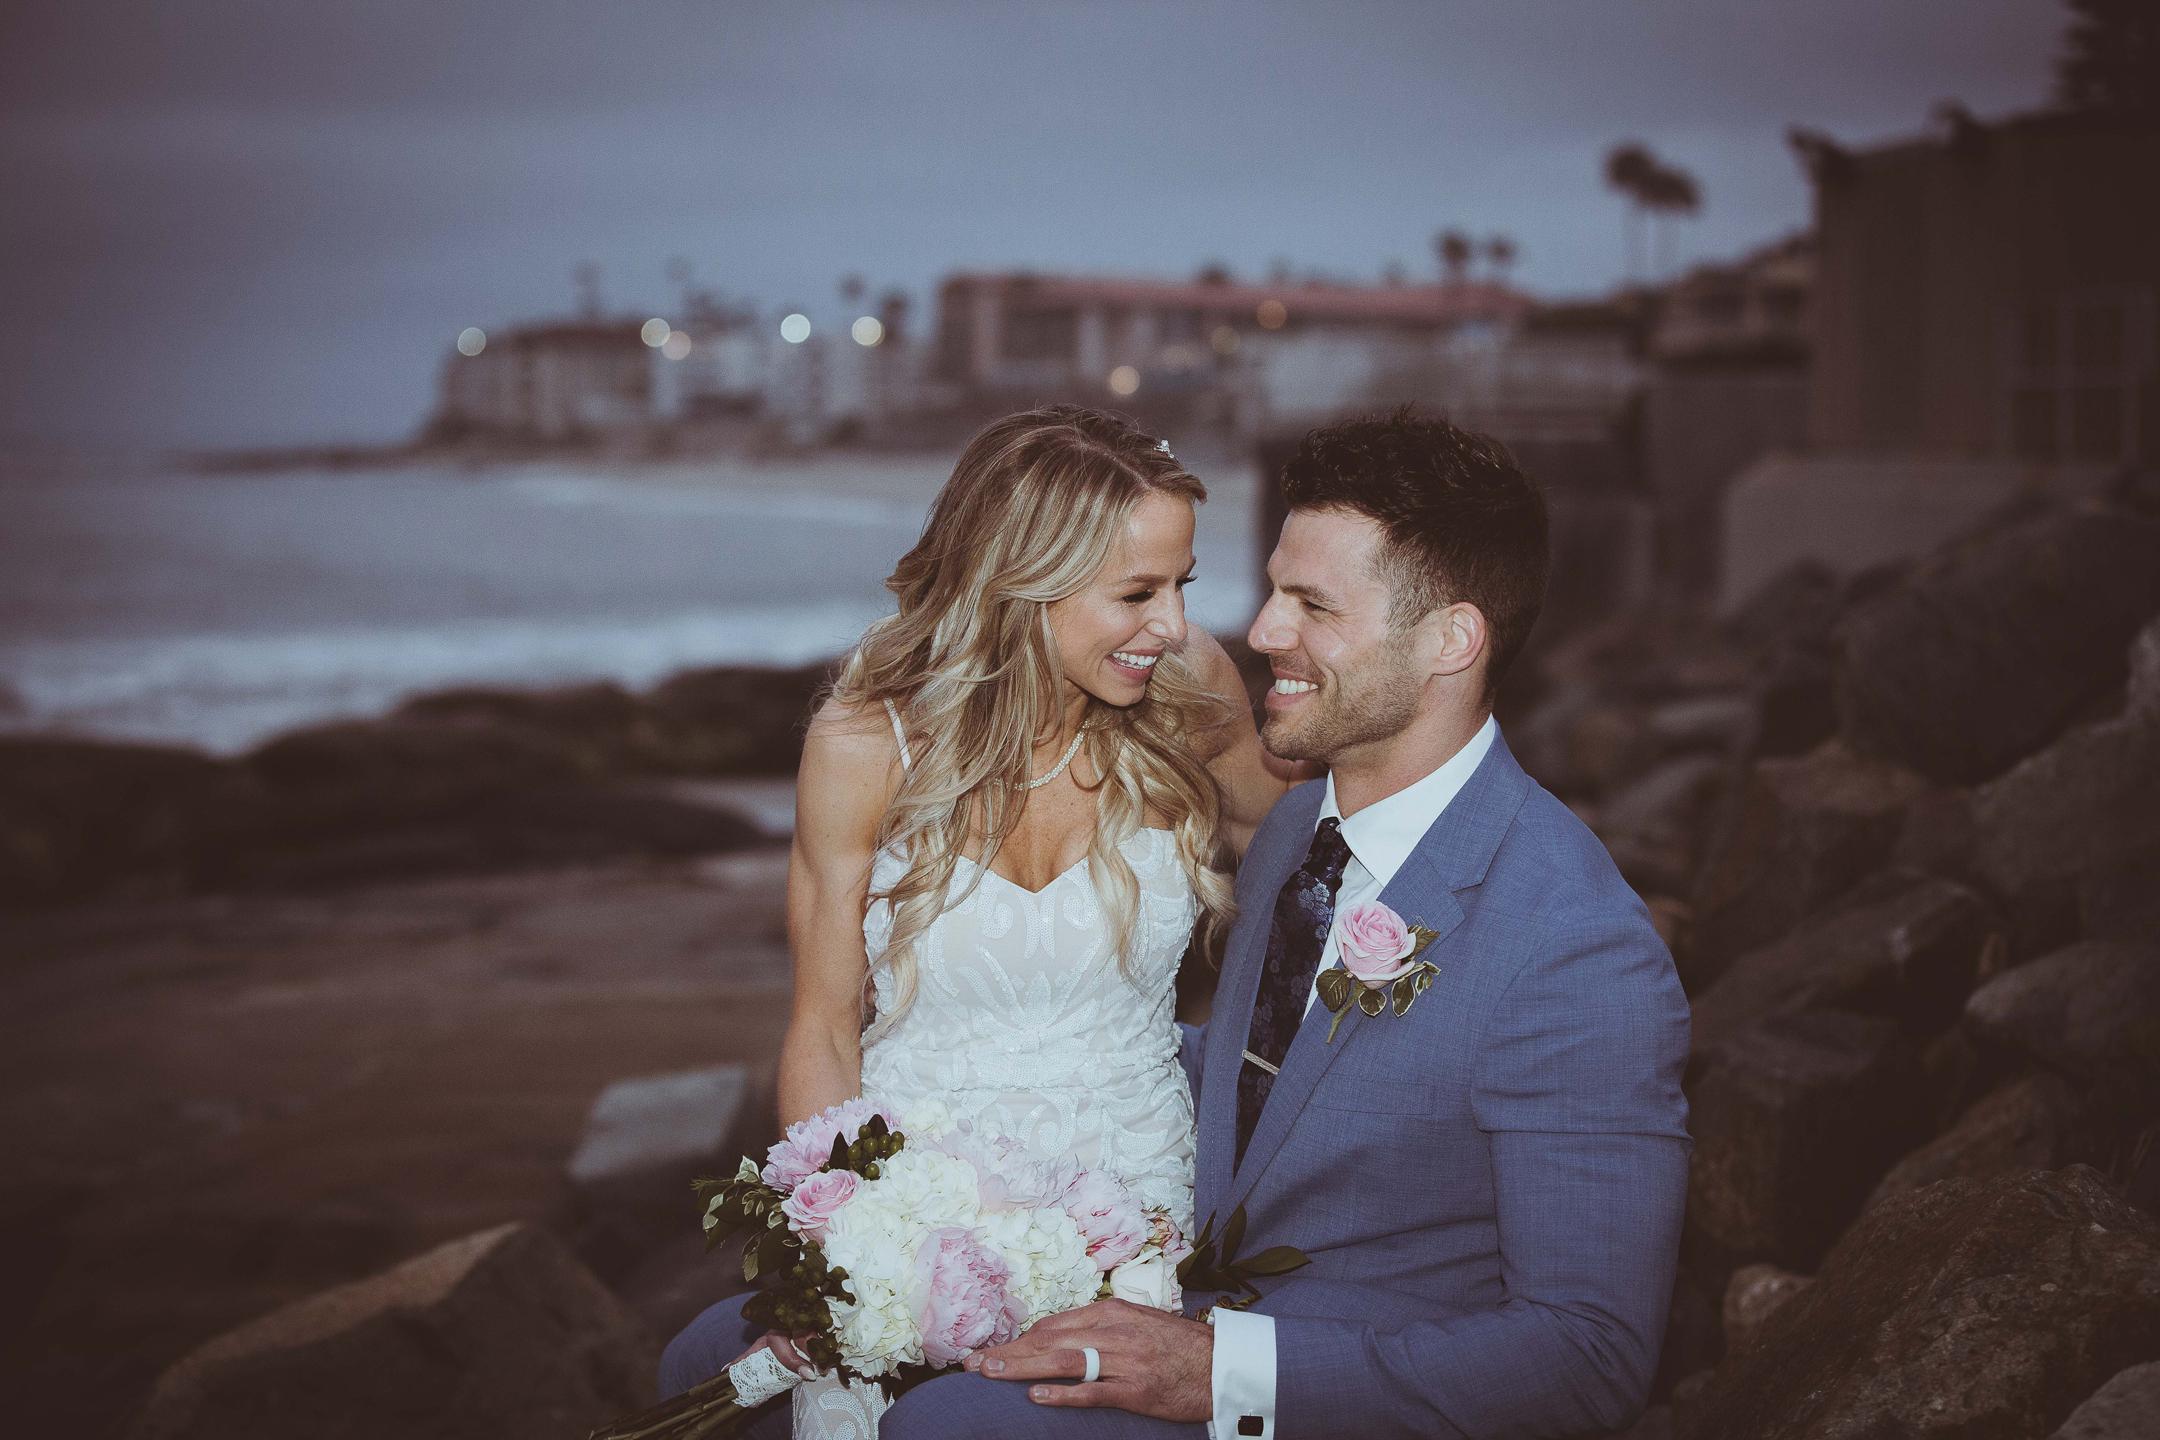 WEDDING photos: La Jolla Beach Elopement